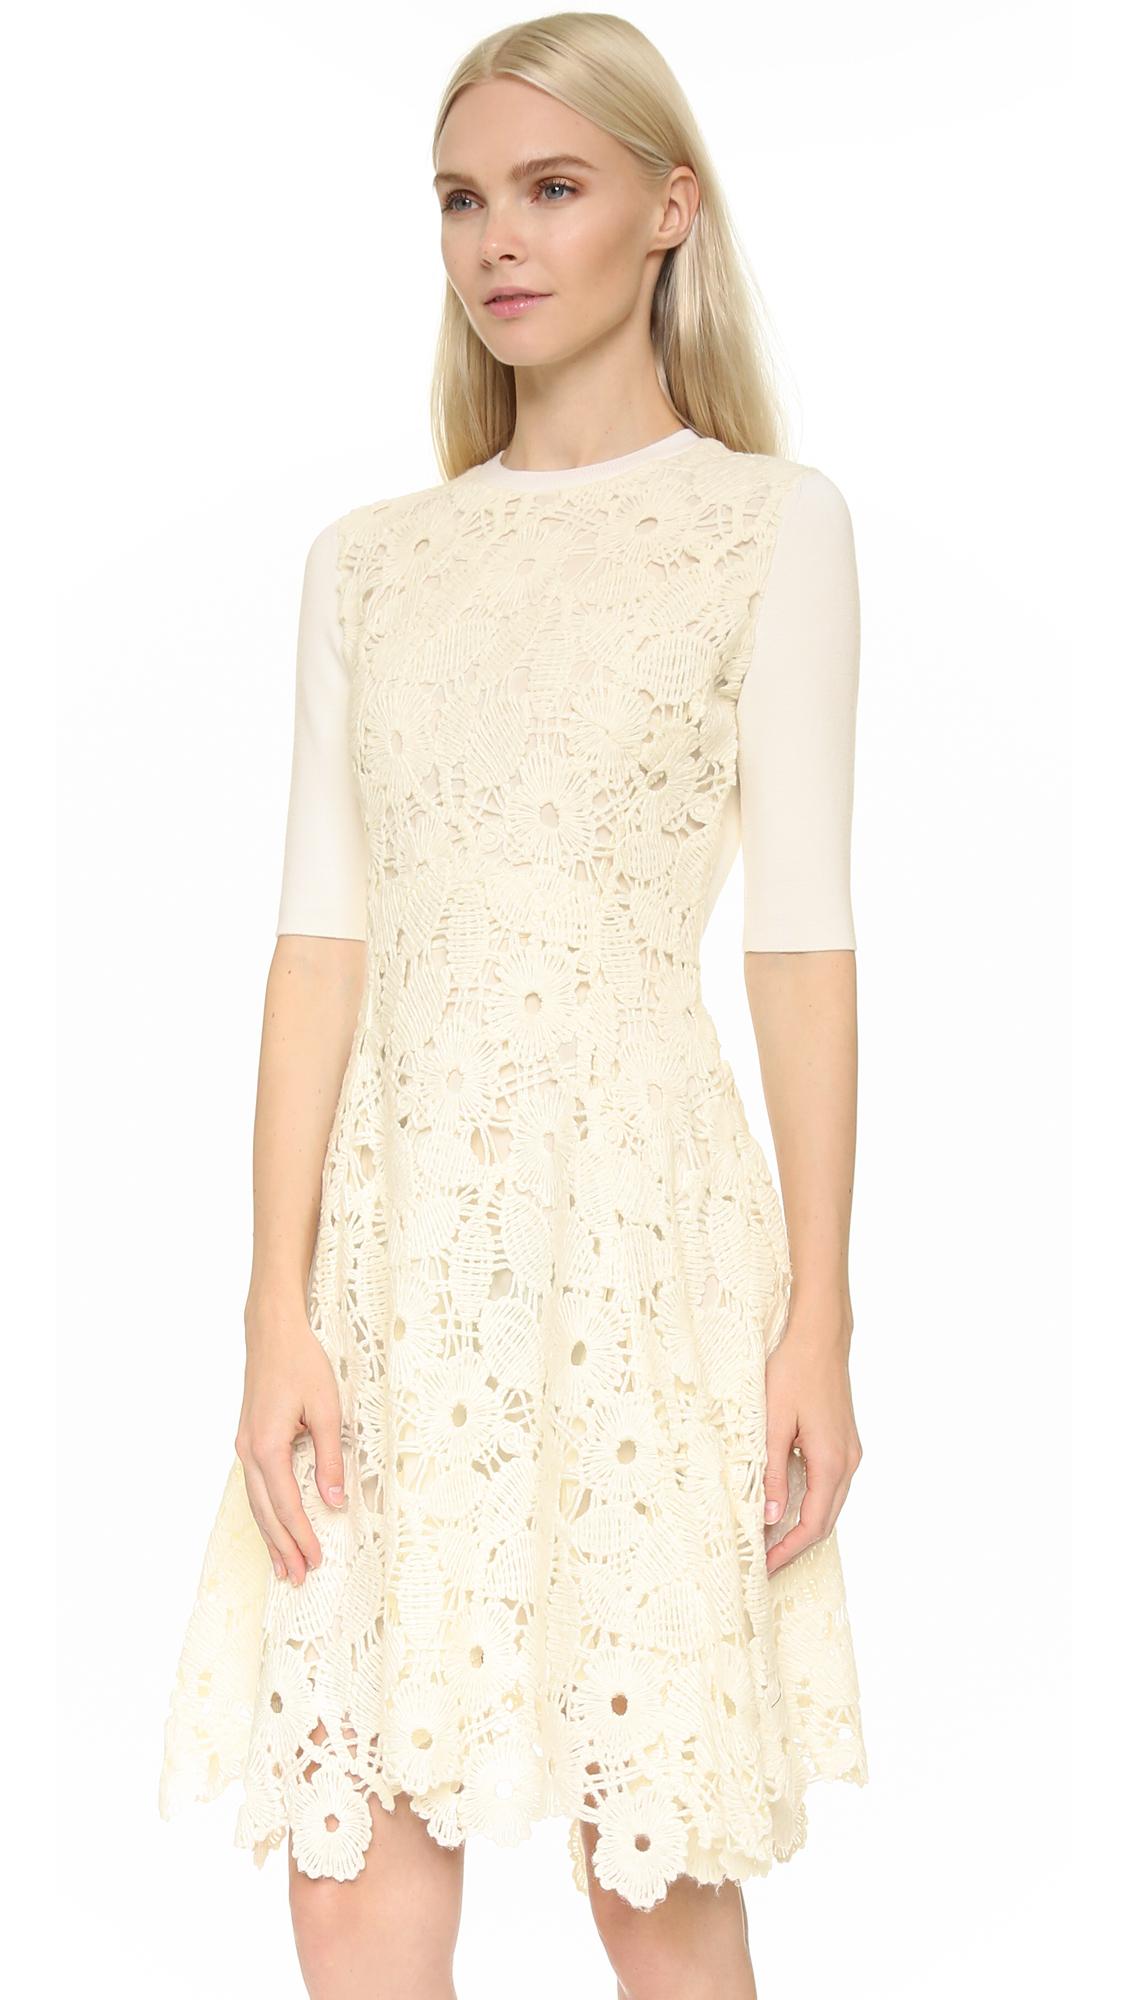 Lela Rose Lace Knit Dress In Ivory